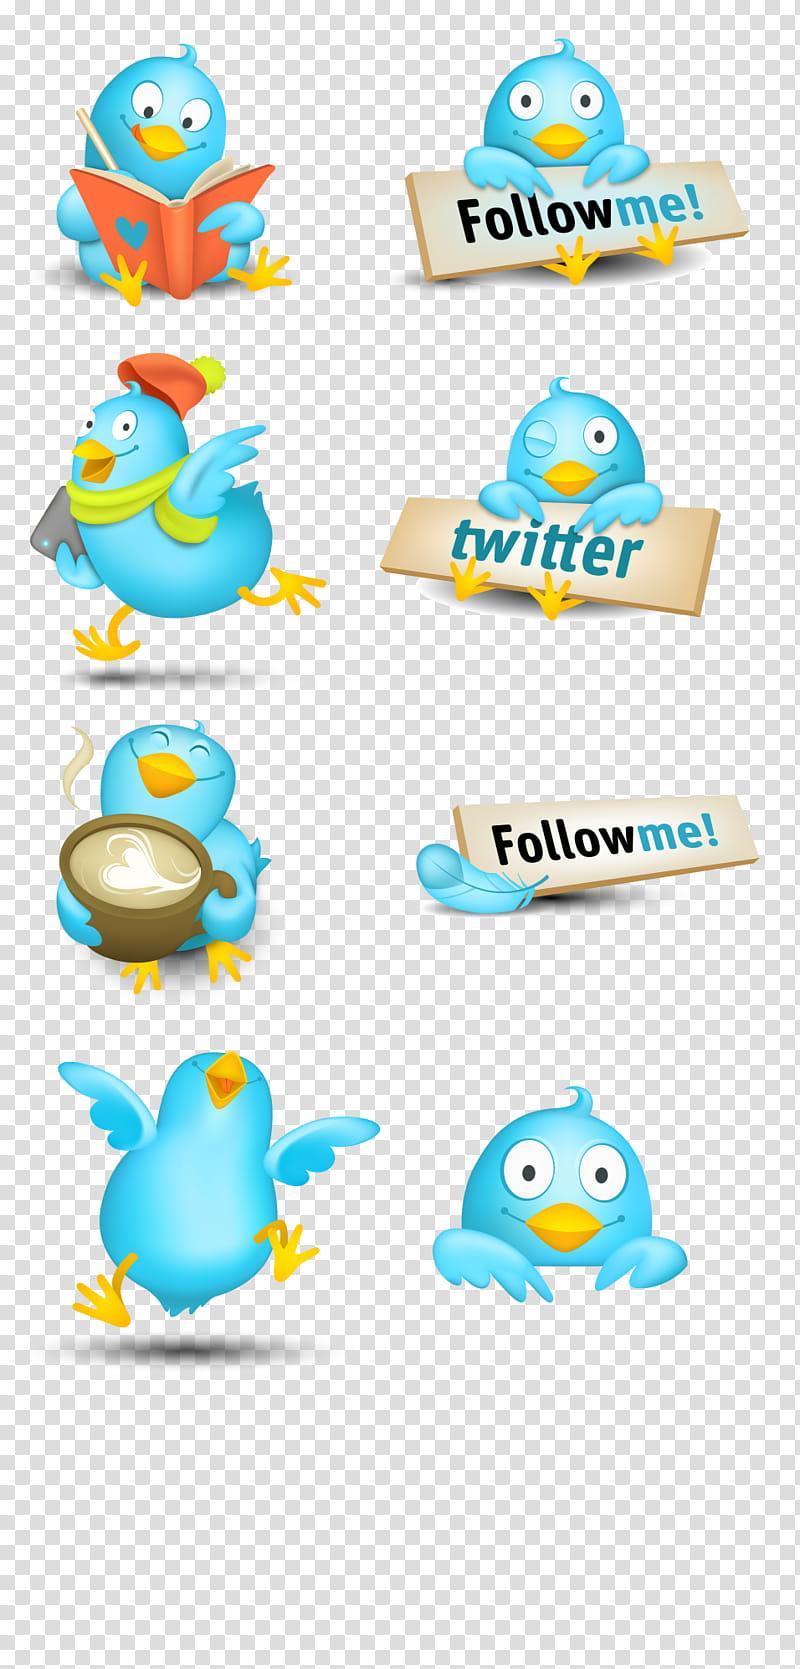 Twitter , follow me! twitter follow me! bird illustration.